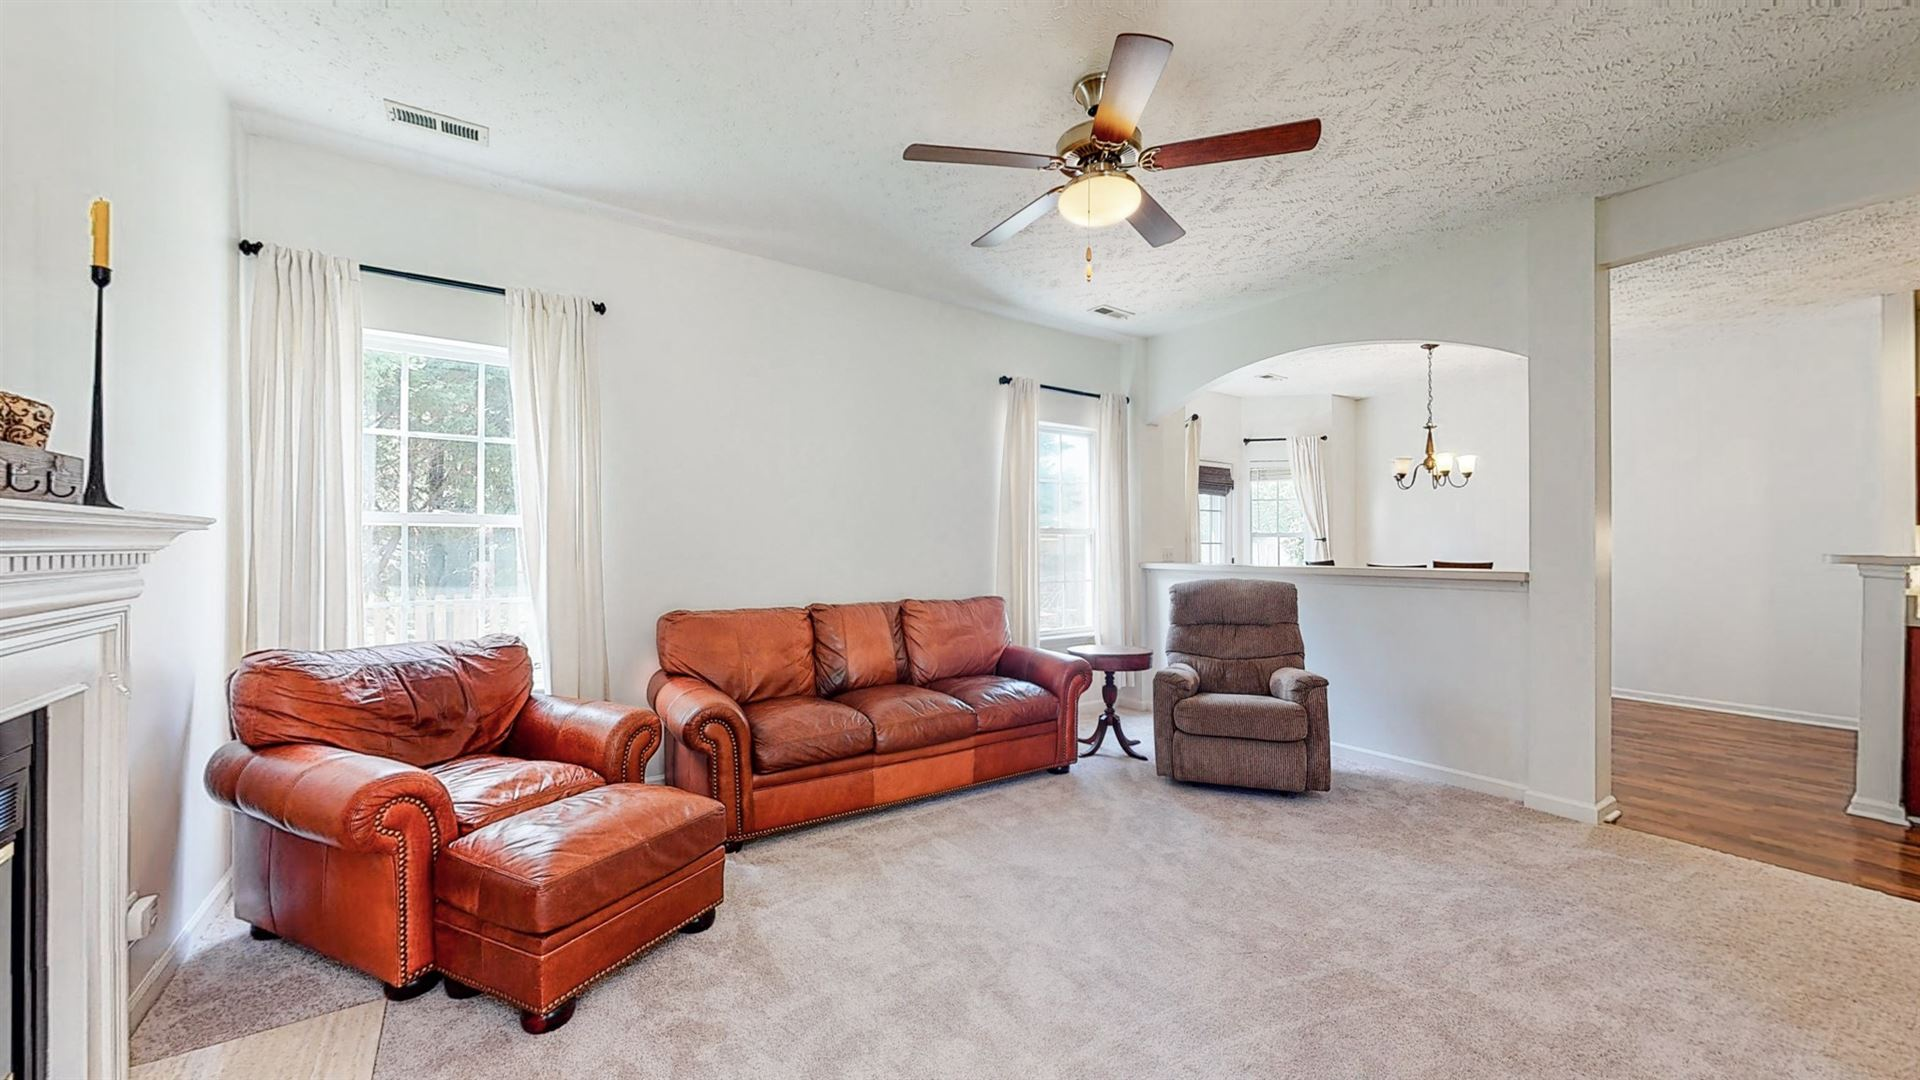 Photo of 3211 Gardendale Dr, Franklin, TN 37064 (MLS # 2248678)